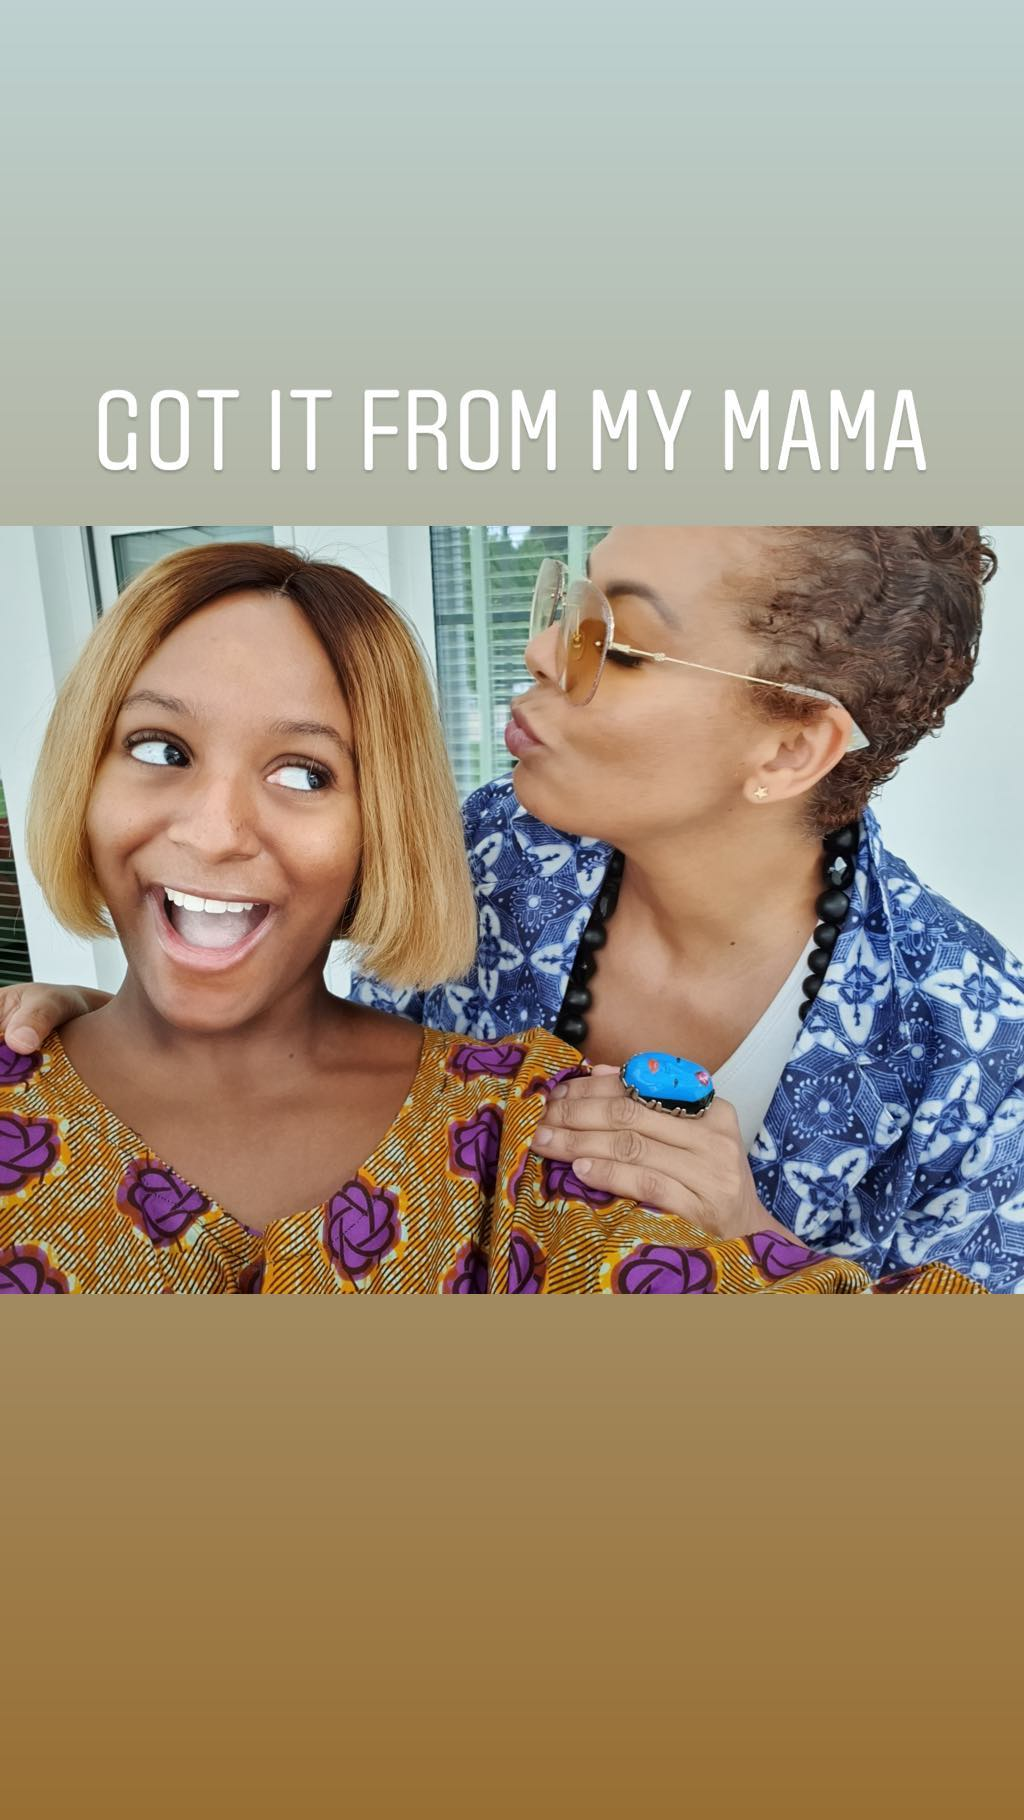 DJ Cuppy & Mum Nana just shared the Cutest Birthday Shoutout to Temi Otedola